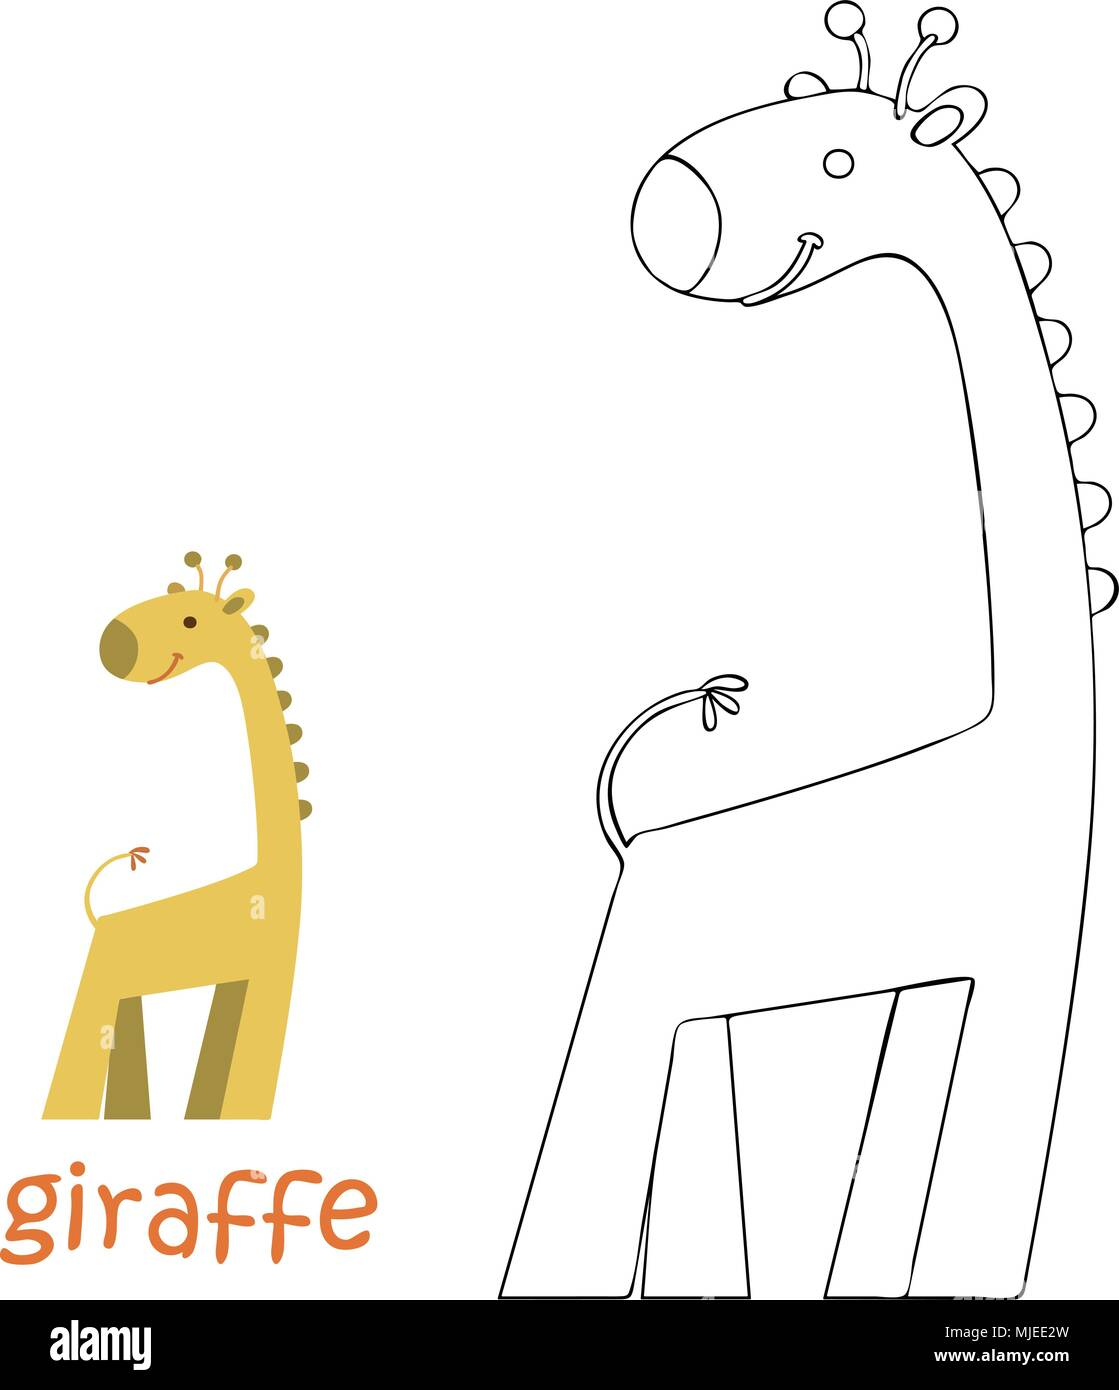 Giraffe Drawing Stockfotos & Giraffe Drawing Bilder - Alamy